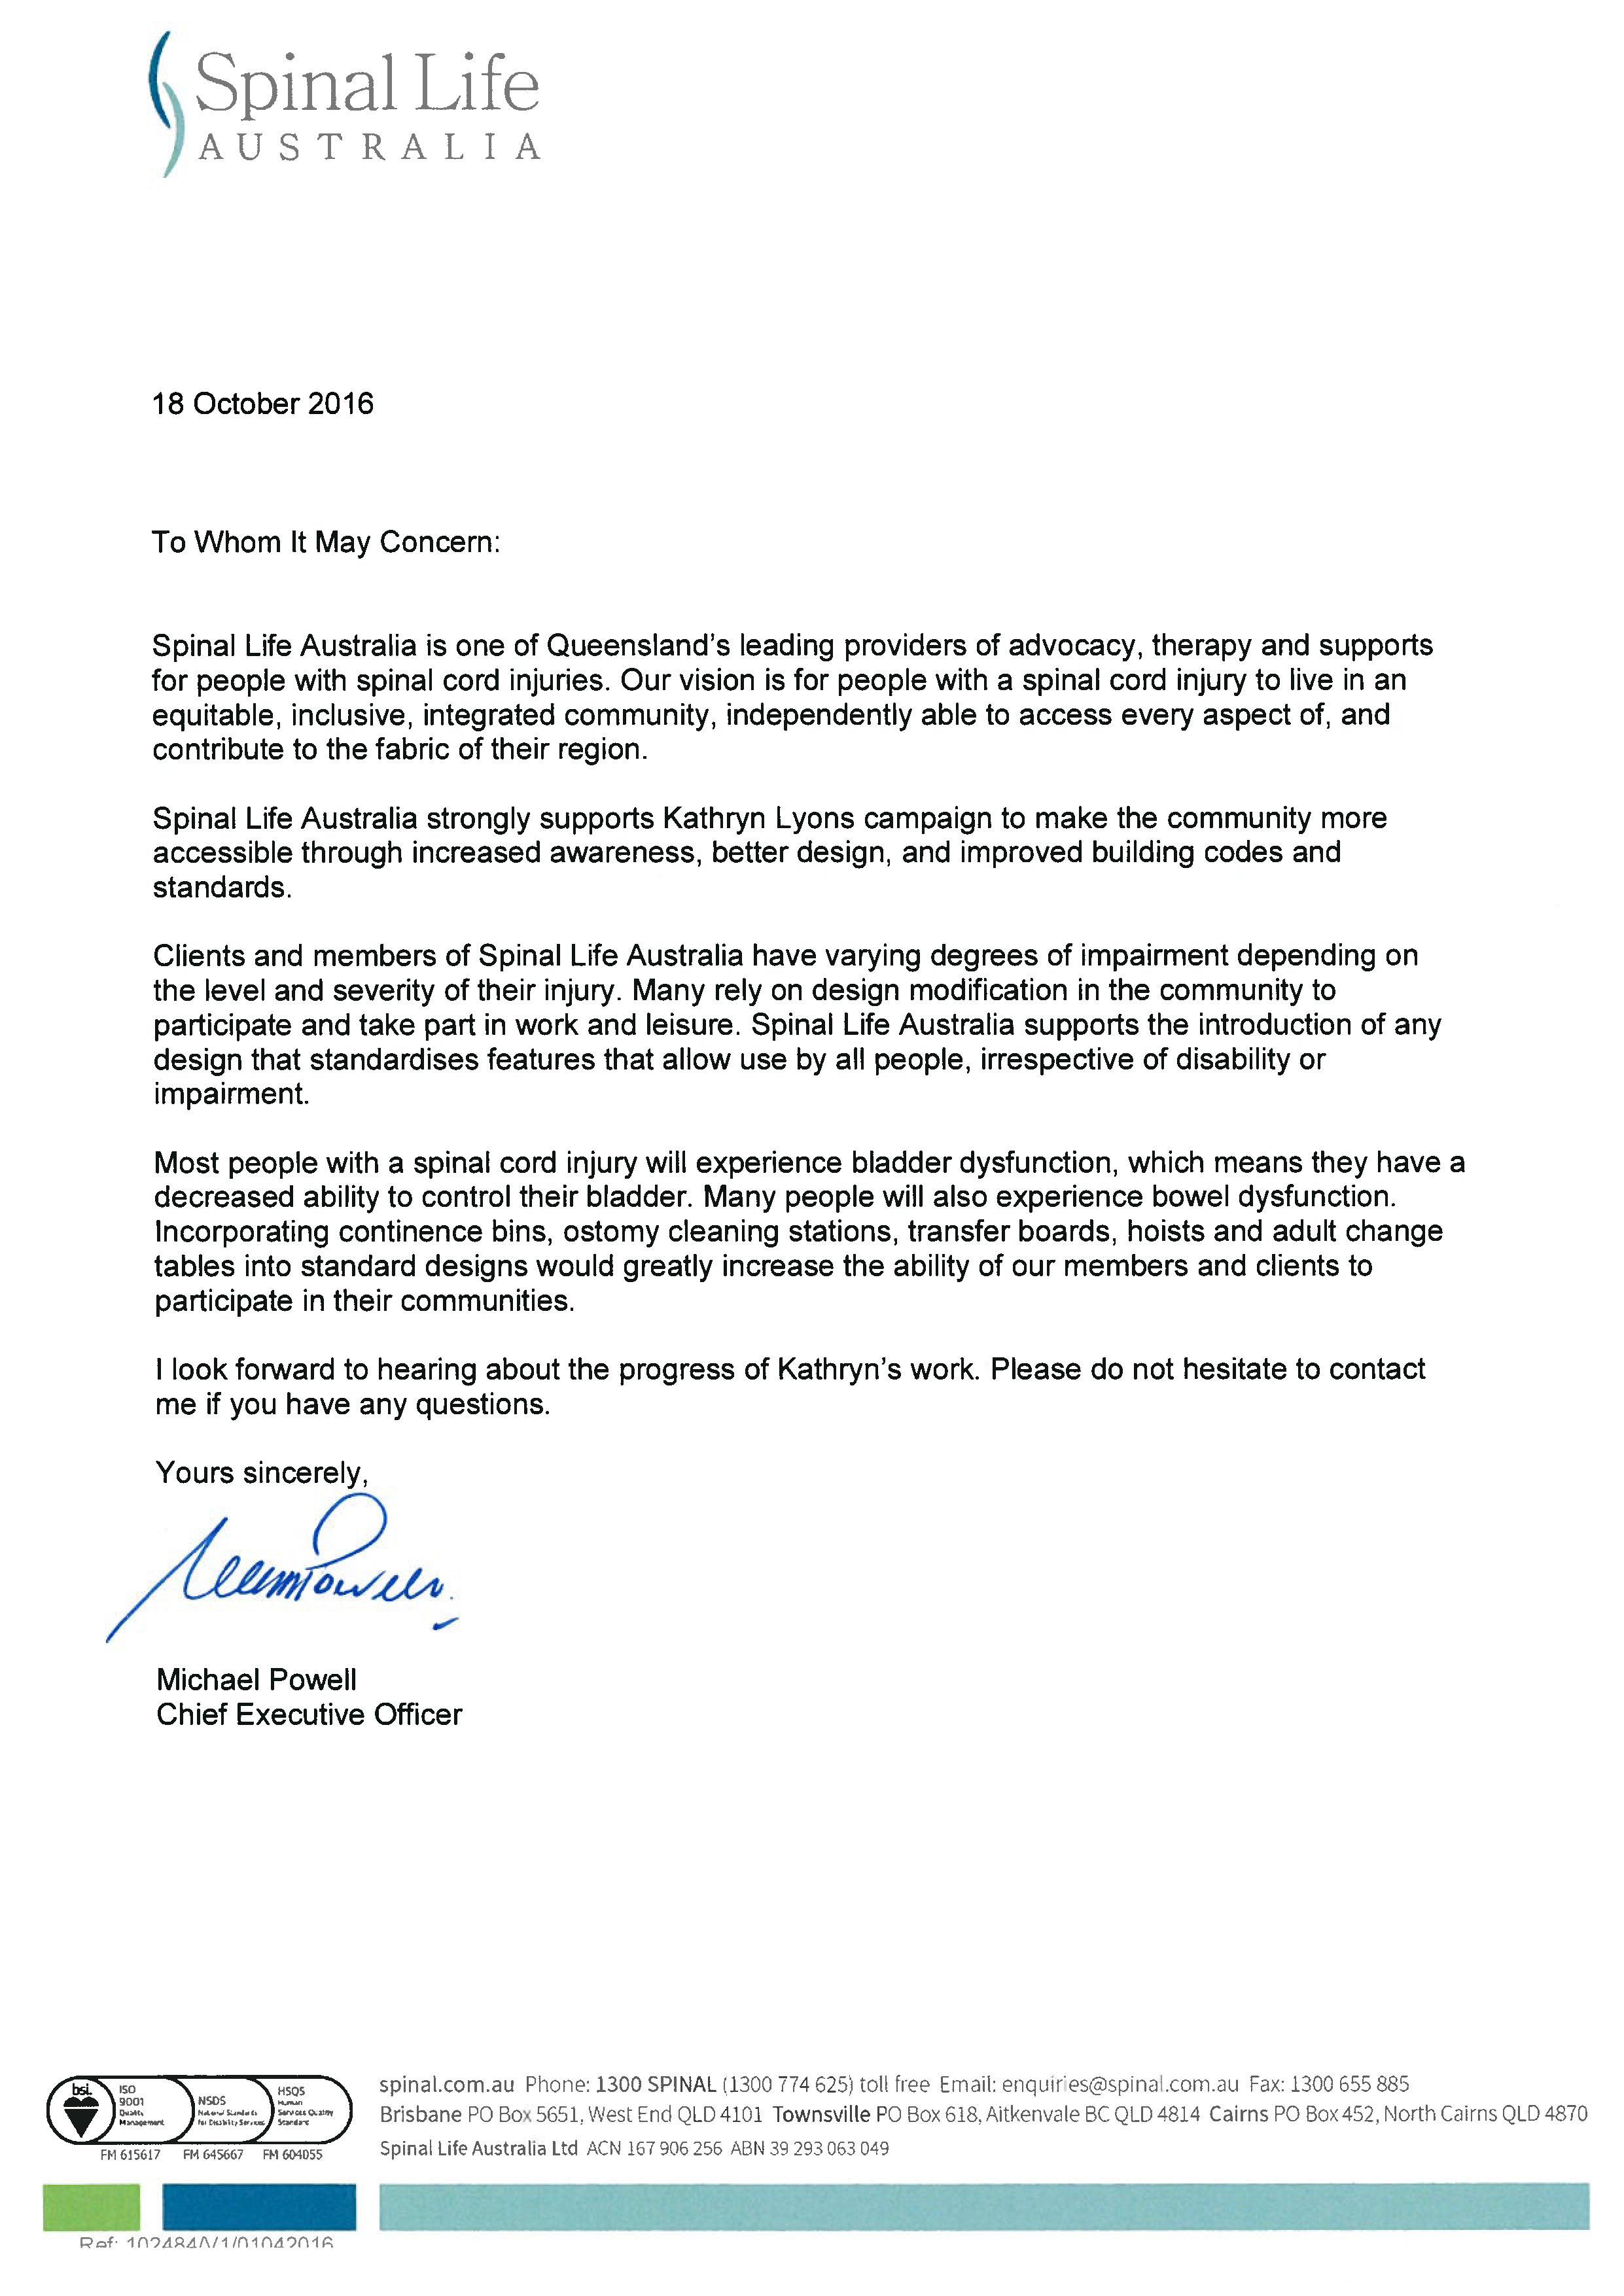 Spinal Life Support Letter.jpg